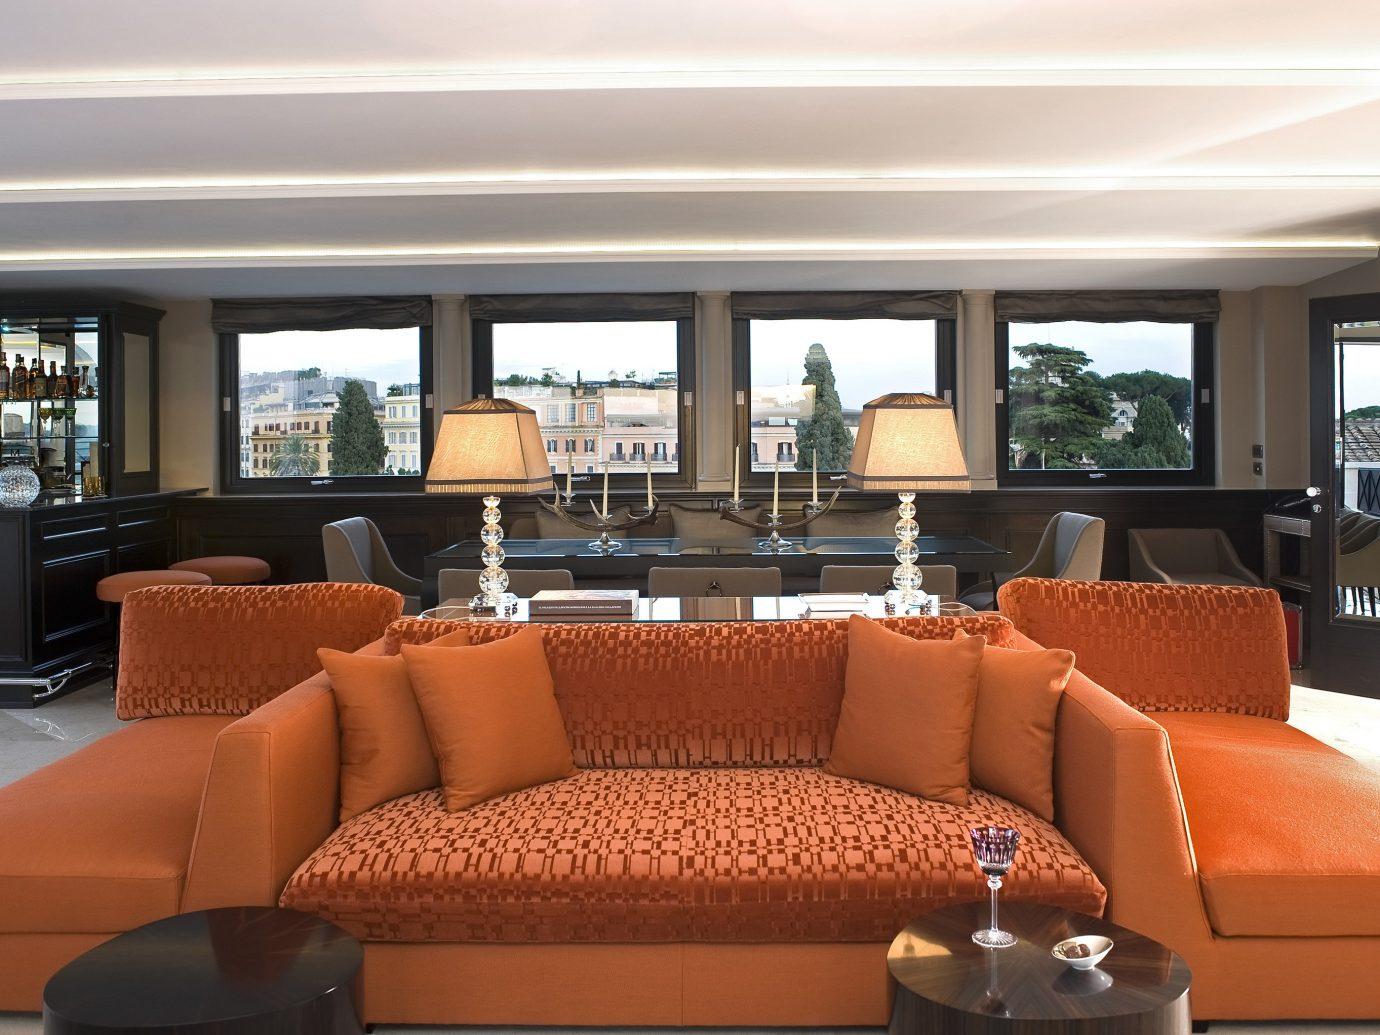 Hotels window sofa indoor Living room passenger ship property Boat living room yacht vehicle estate interior design home Suite luxury yacht condominium real estate ship furniture Resort